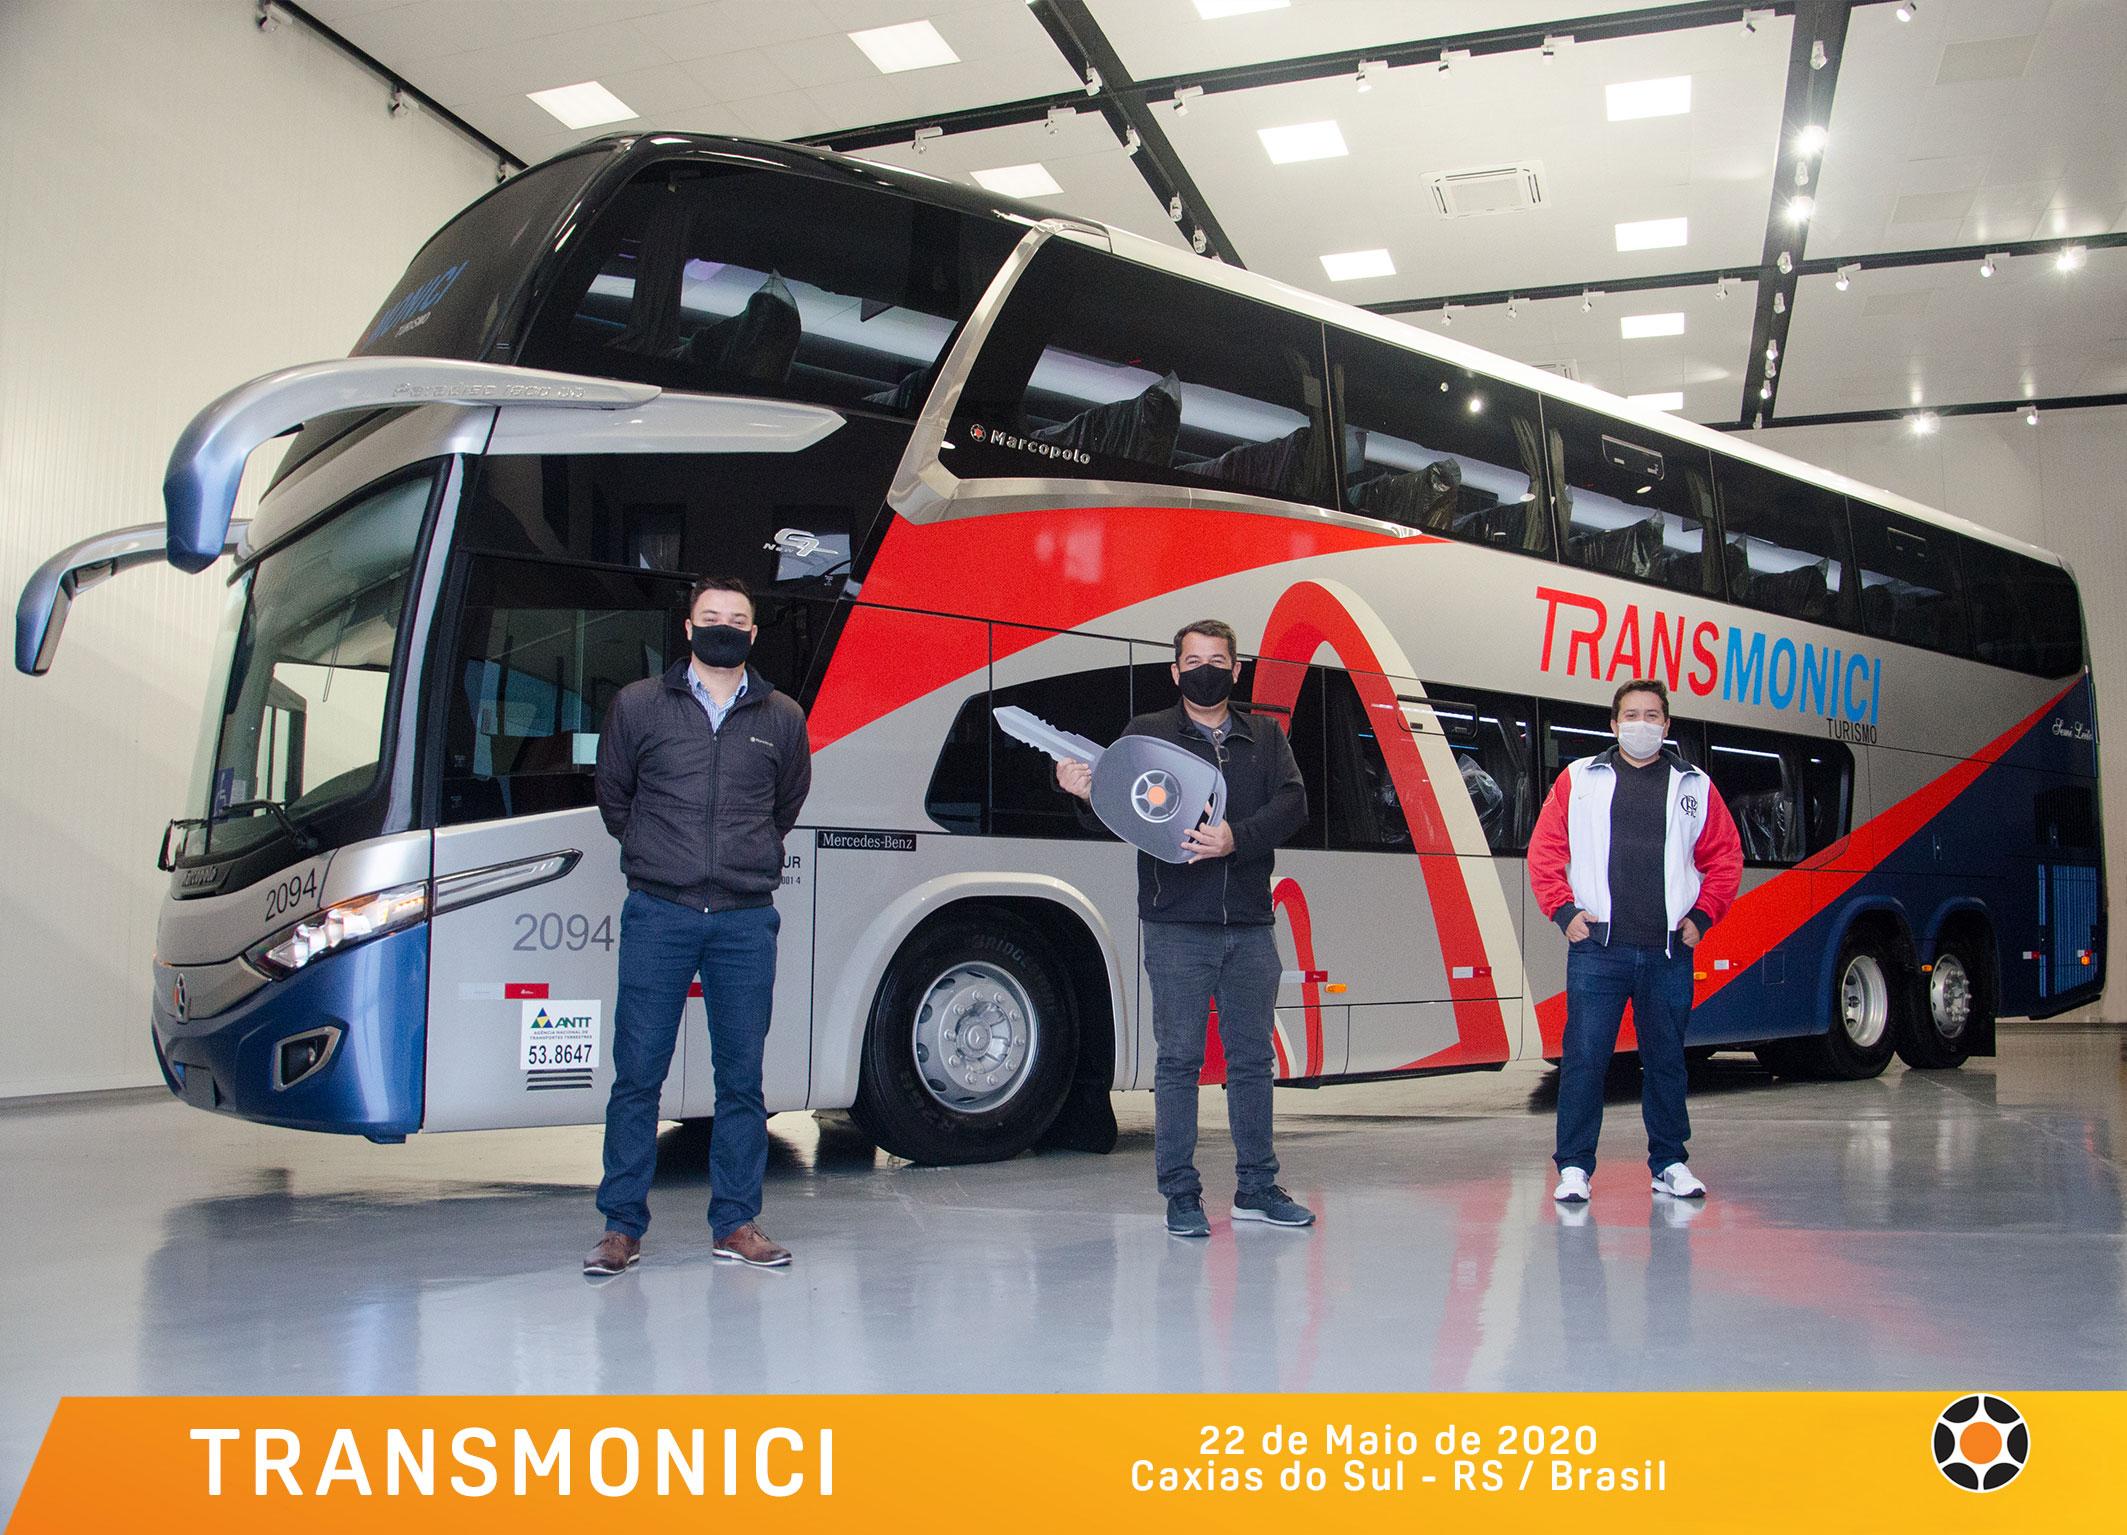 TRANSMONICI